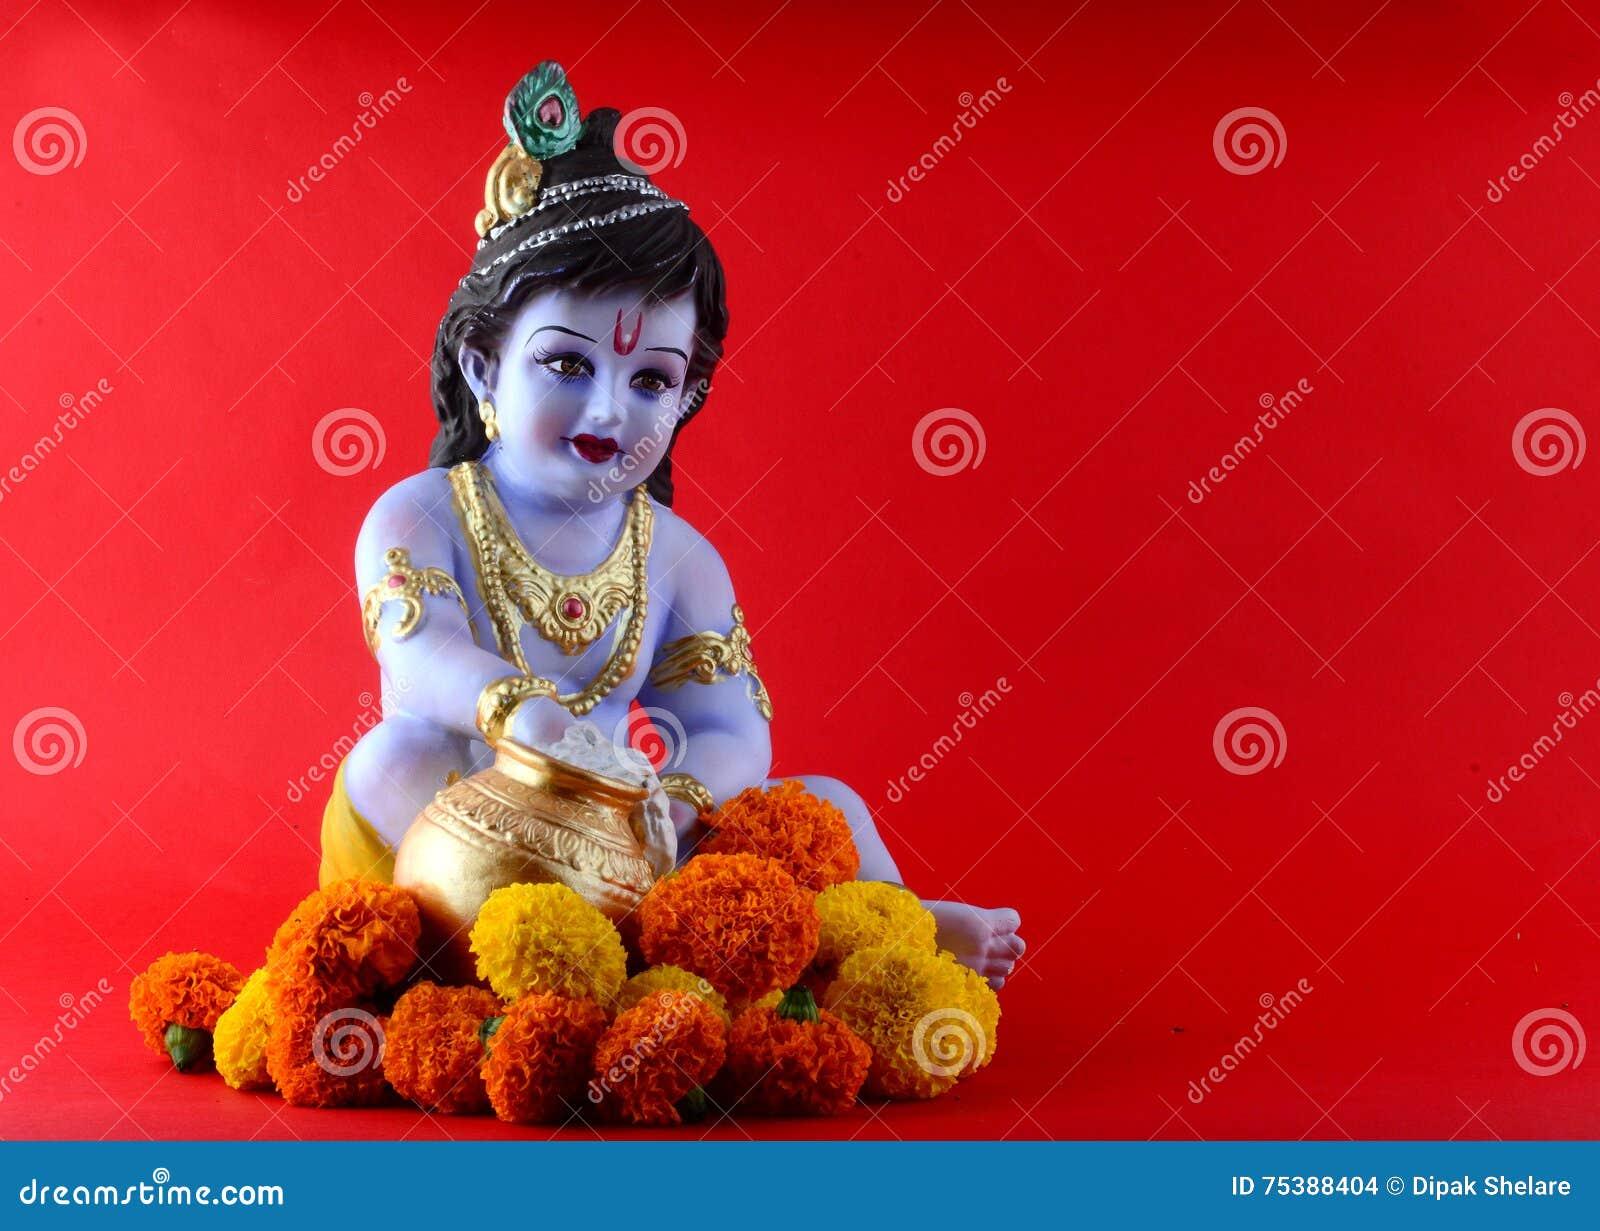 Krishna hinduskiego boga